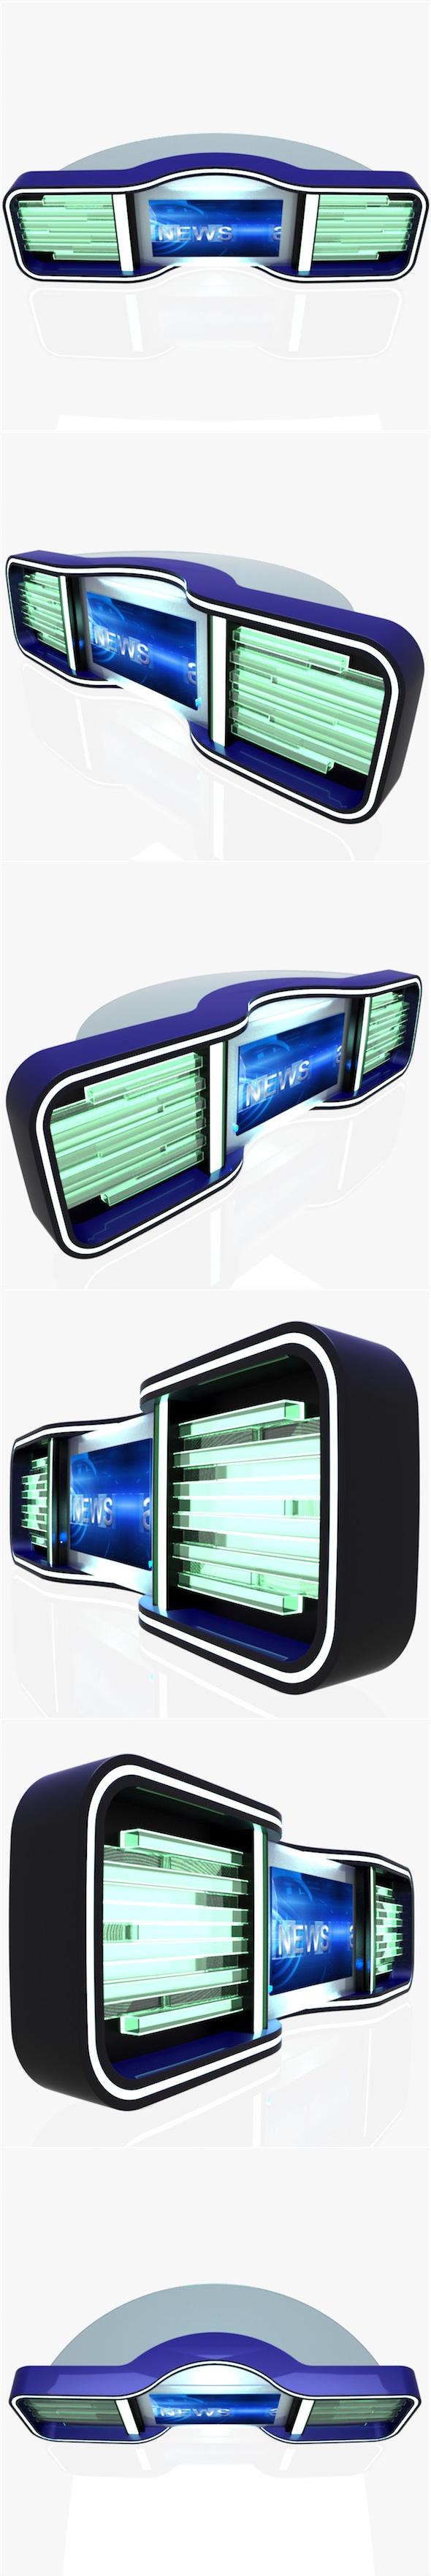 Virtual Tv Studio News Desk 5 - 3DOcean Item for Sale